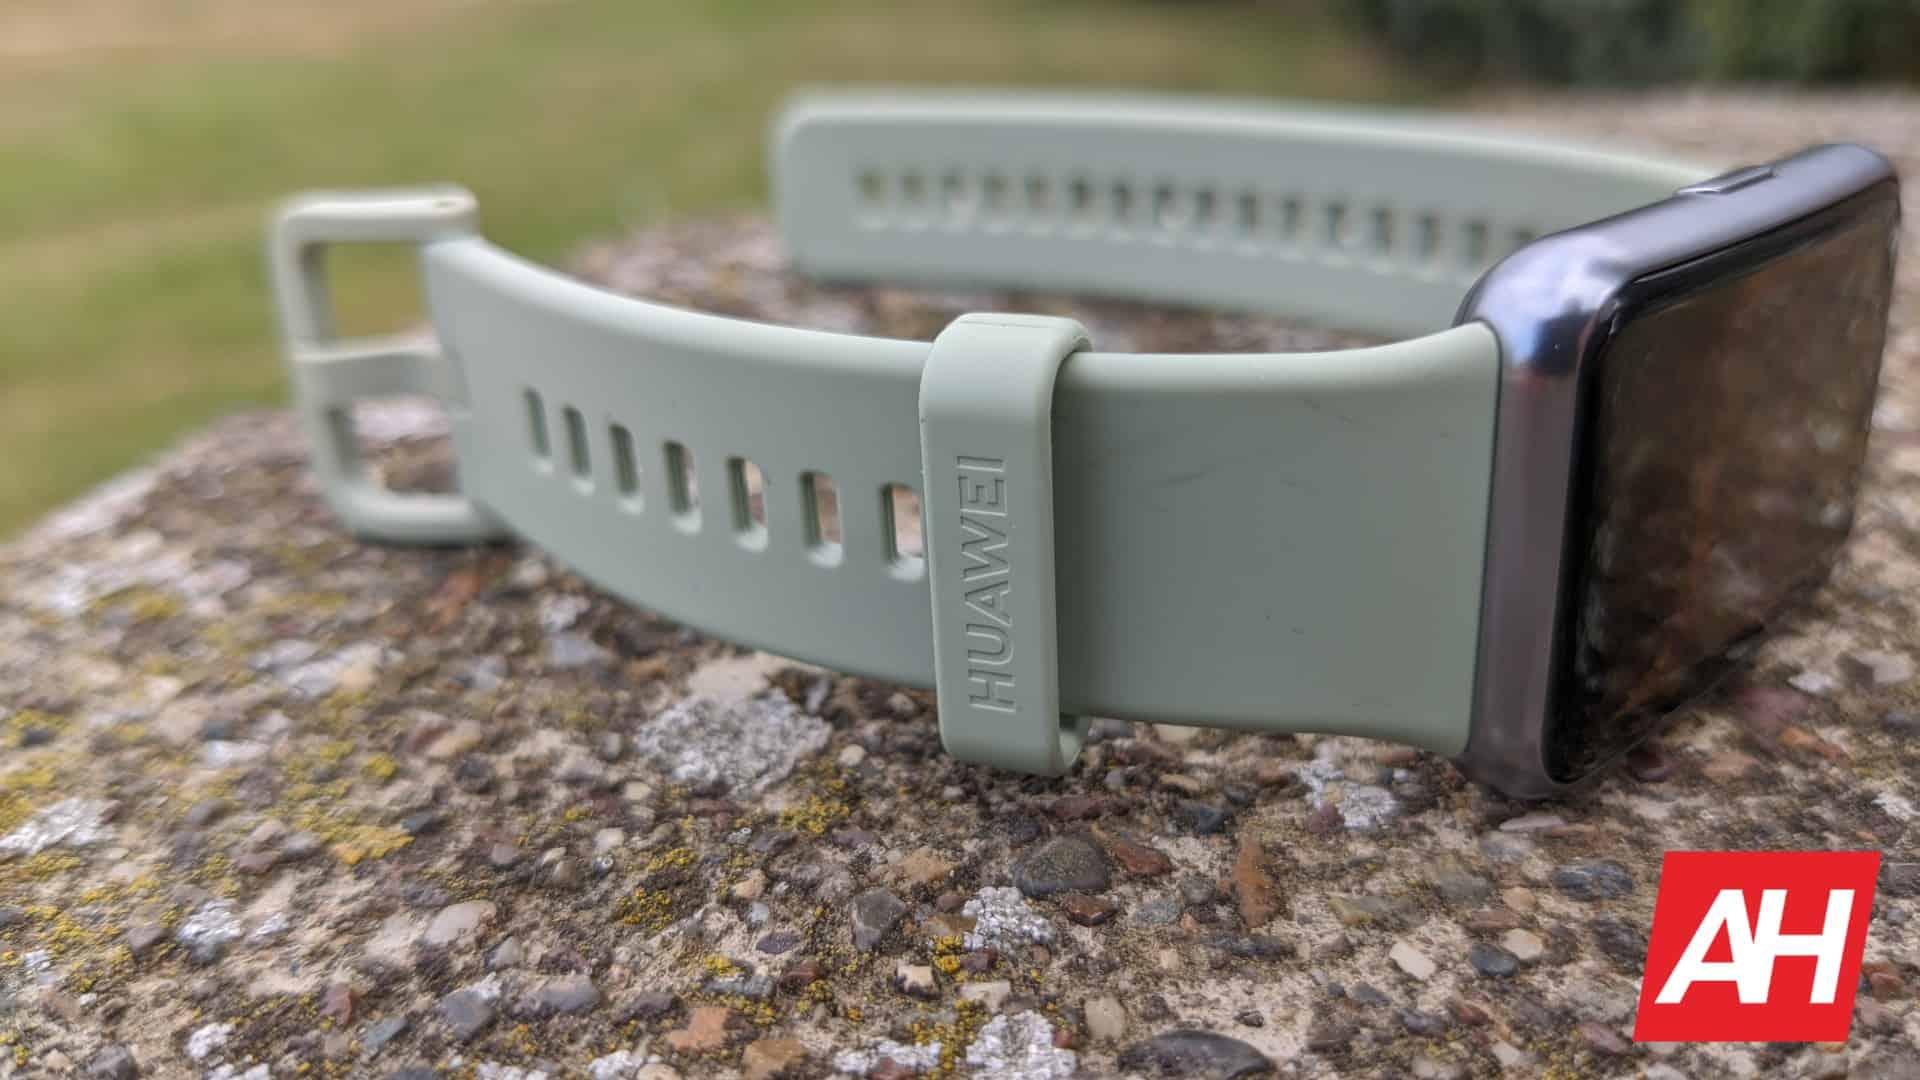 AH Huawei Watch Fit 17